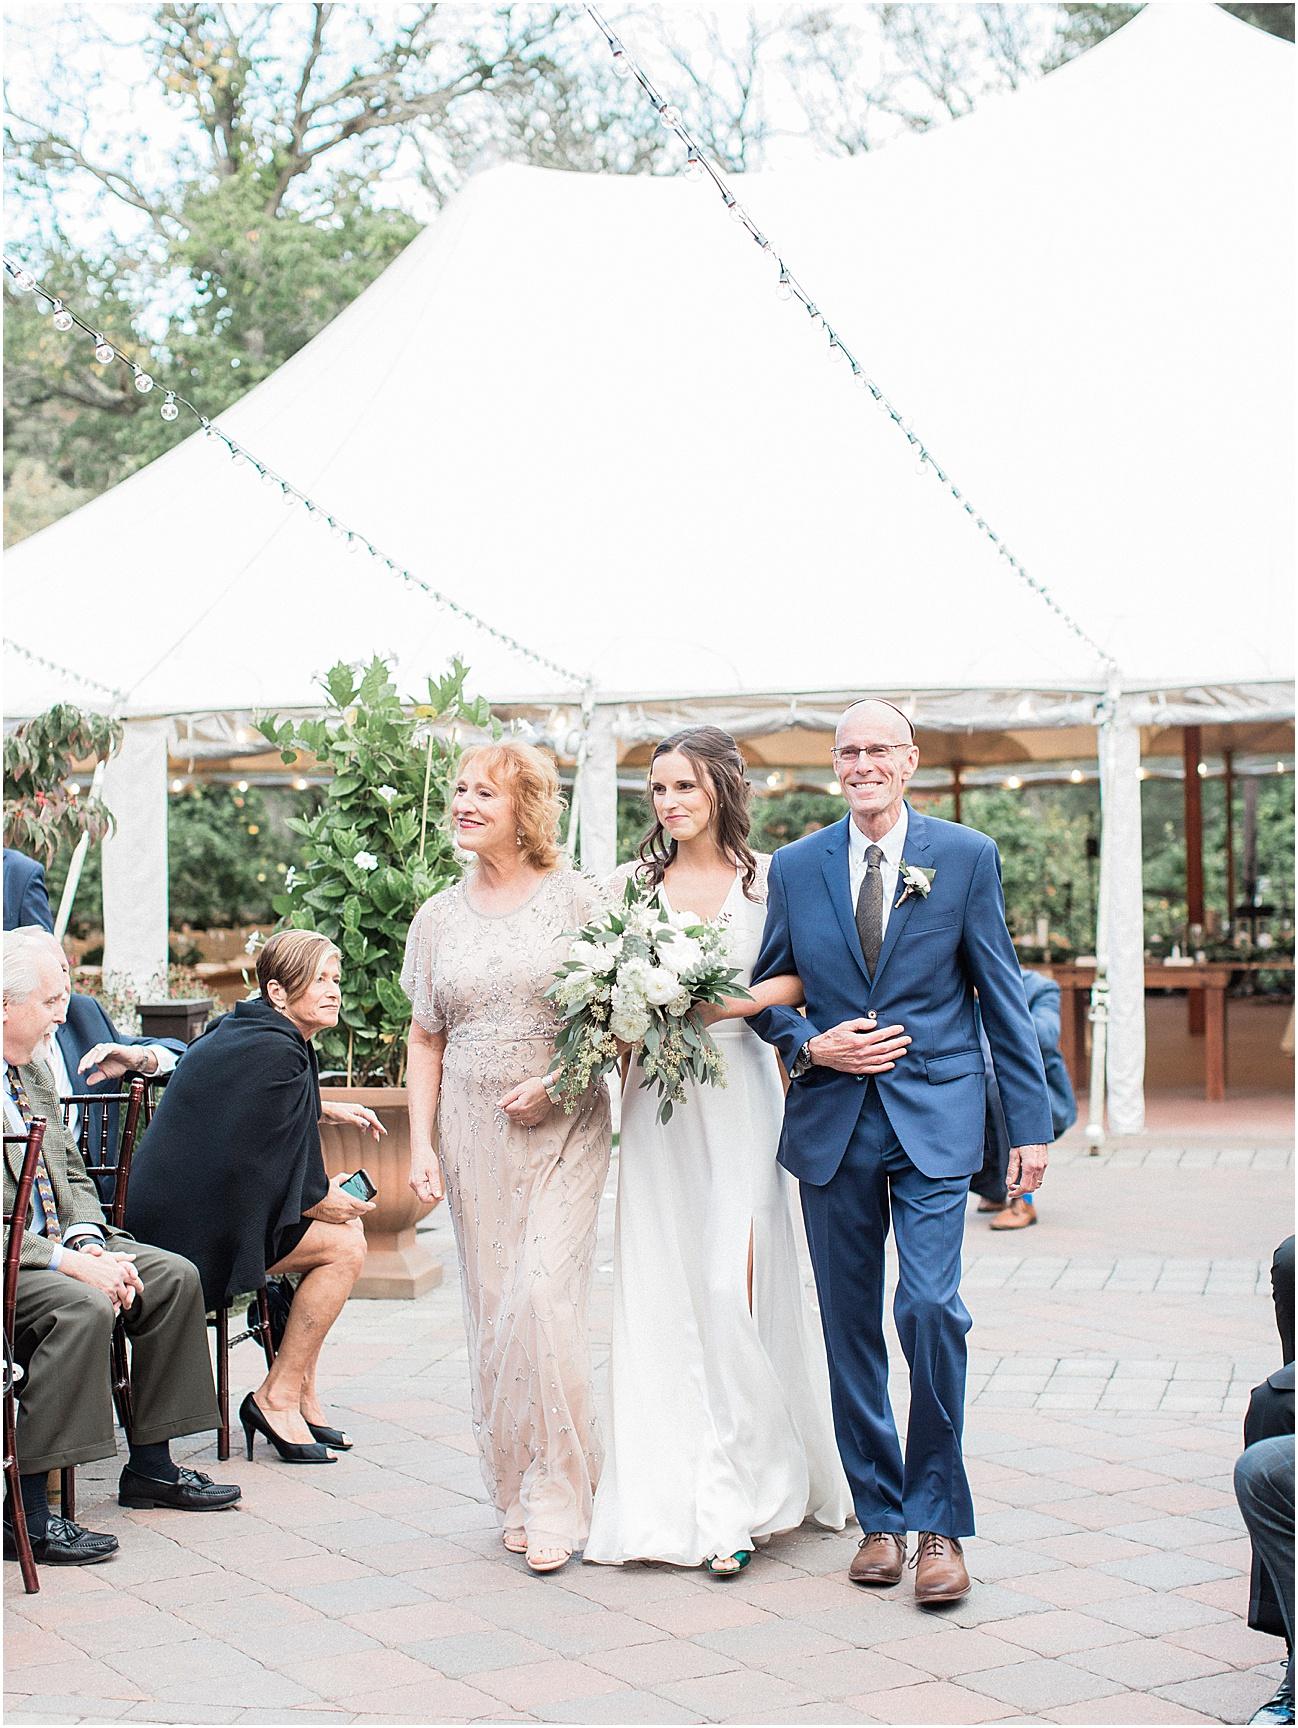 jenna_mike_willowdale_estate_topsfield_neutral_whites_greens_fall_cape_cod_boston_wedding_photographer_meredith_jane_photography_photo_1448.jpg